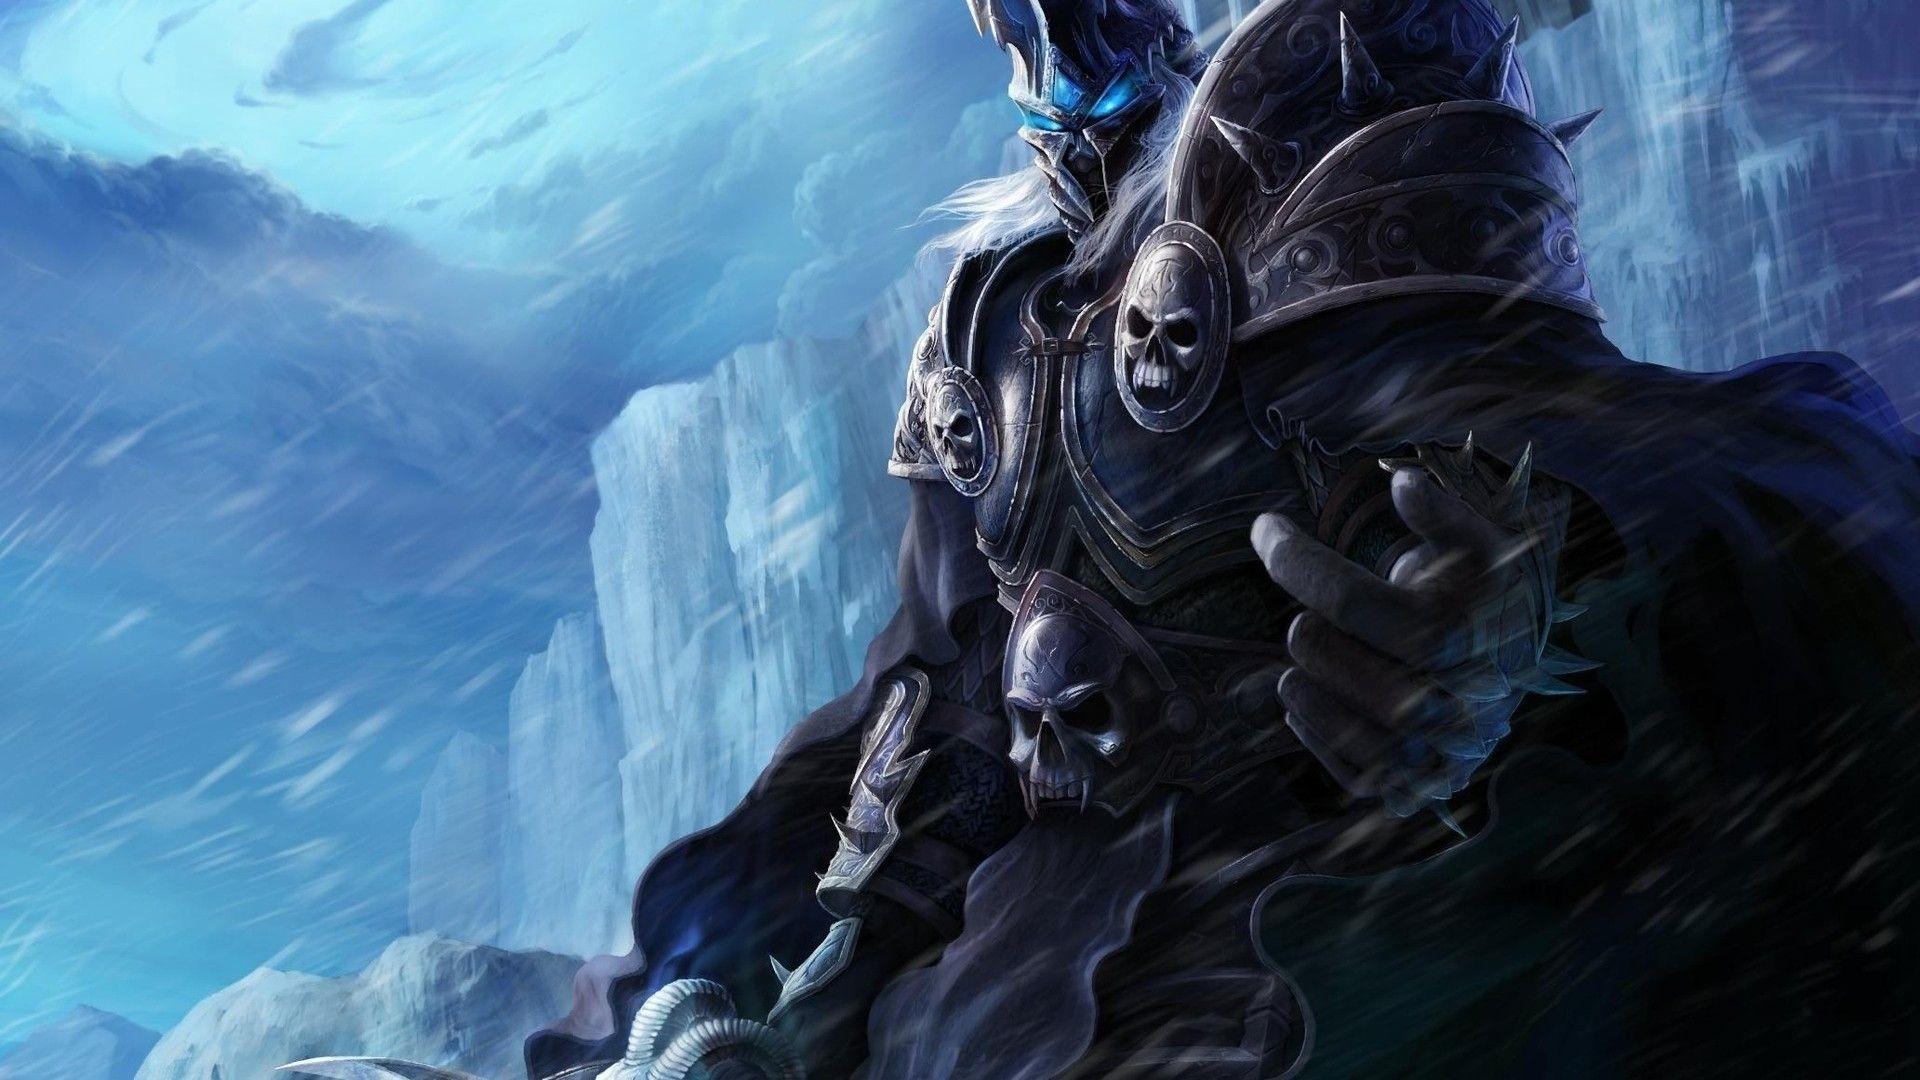 Full HD Wallpaper world of warcraft ice necromancer knight .